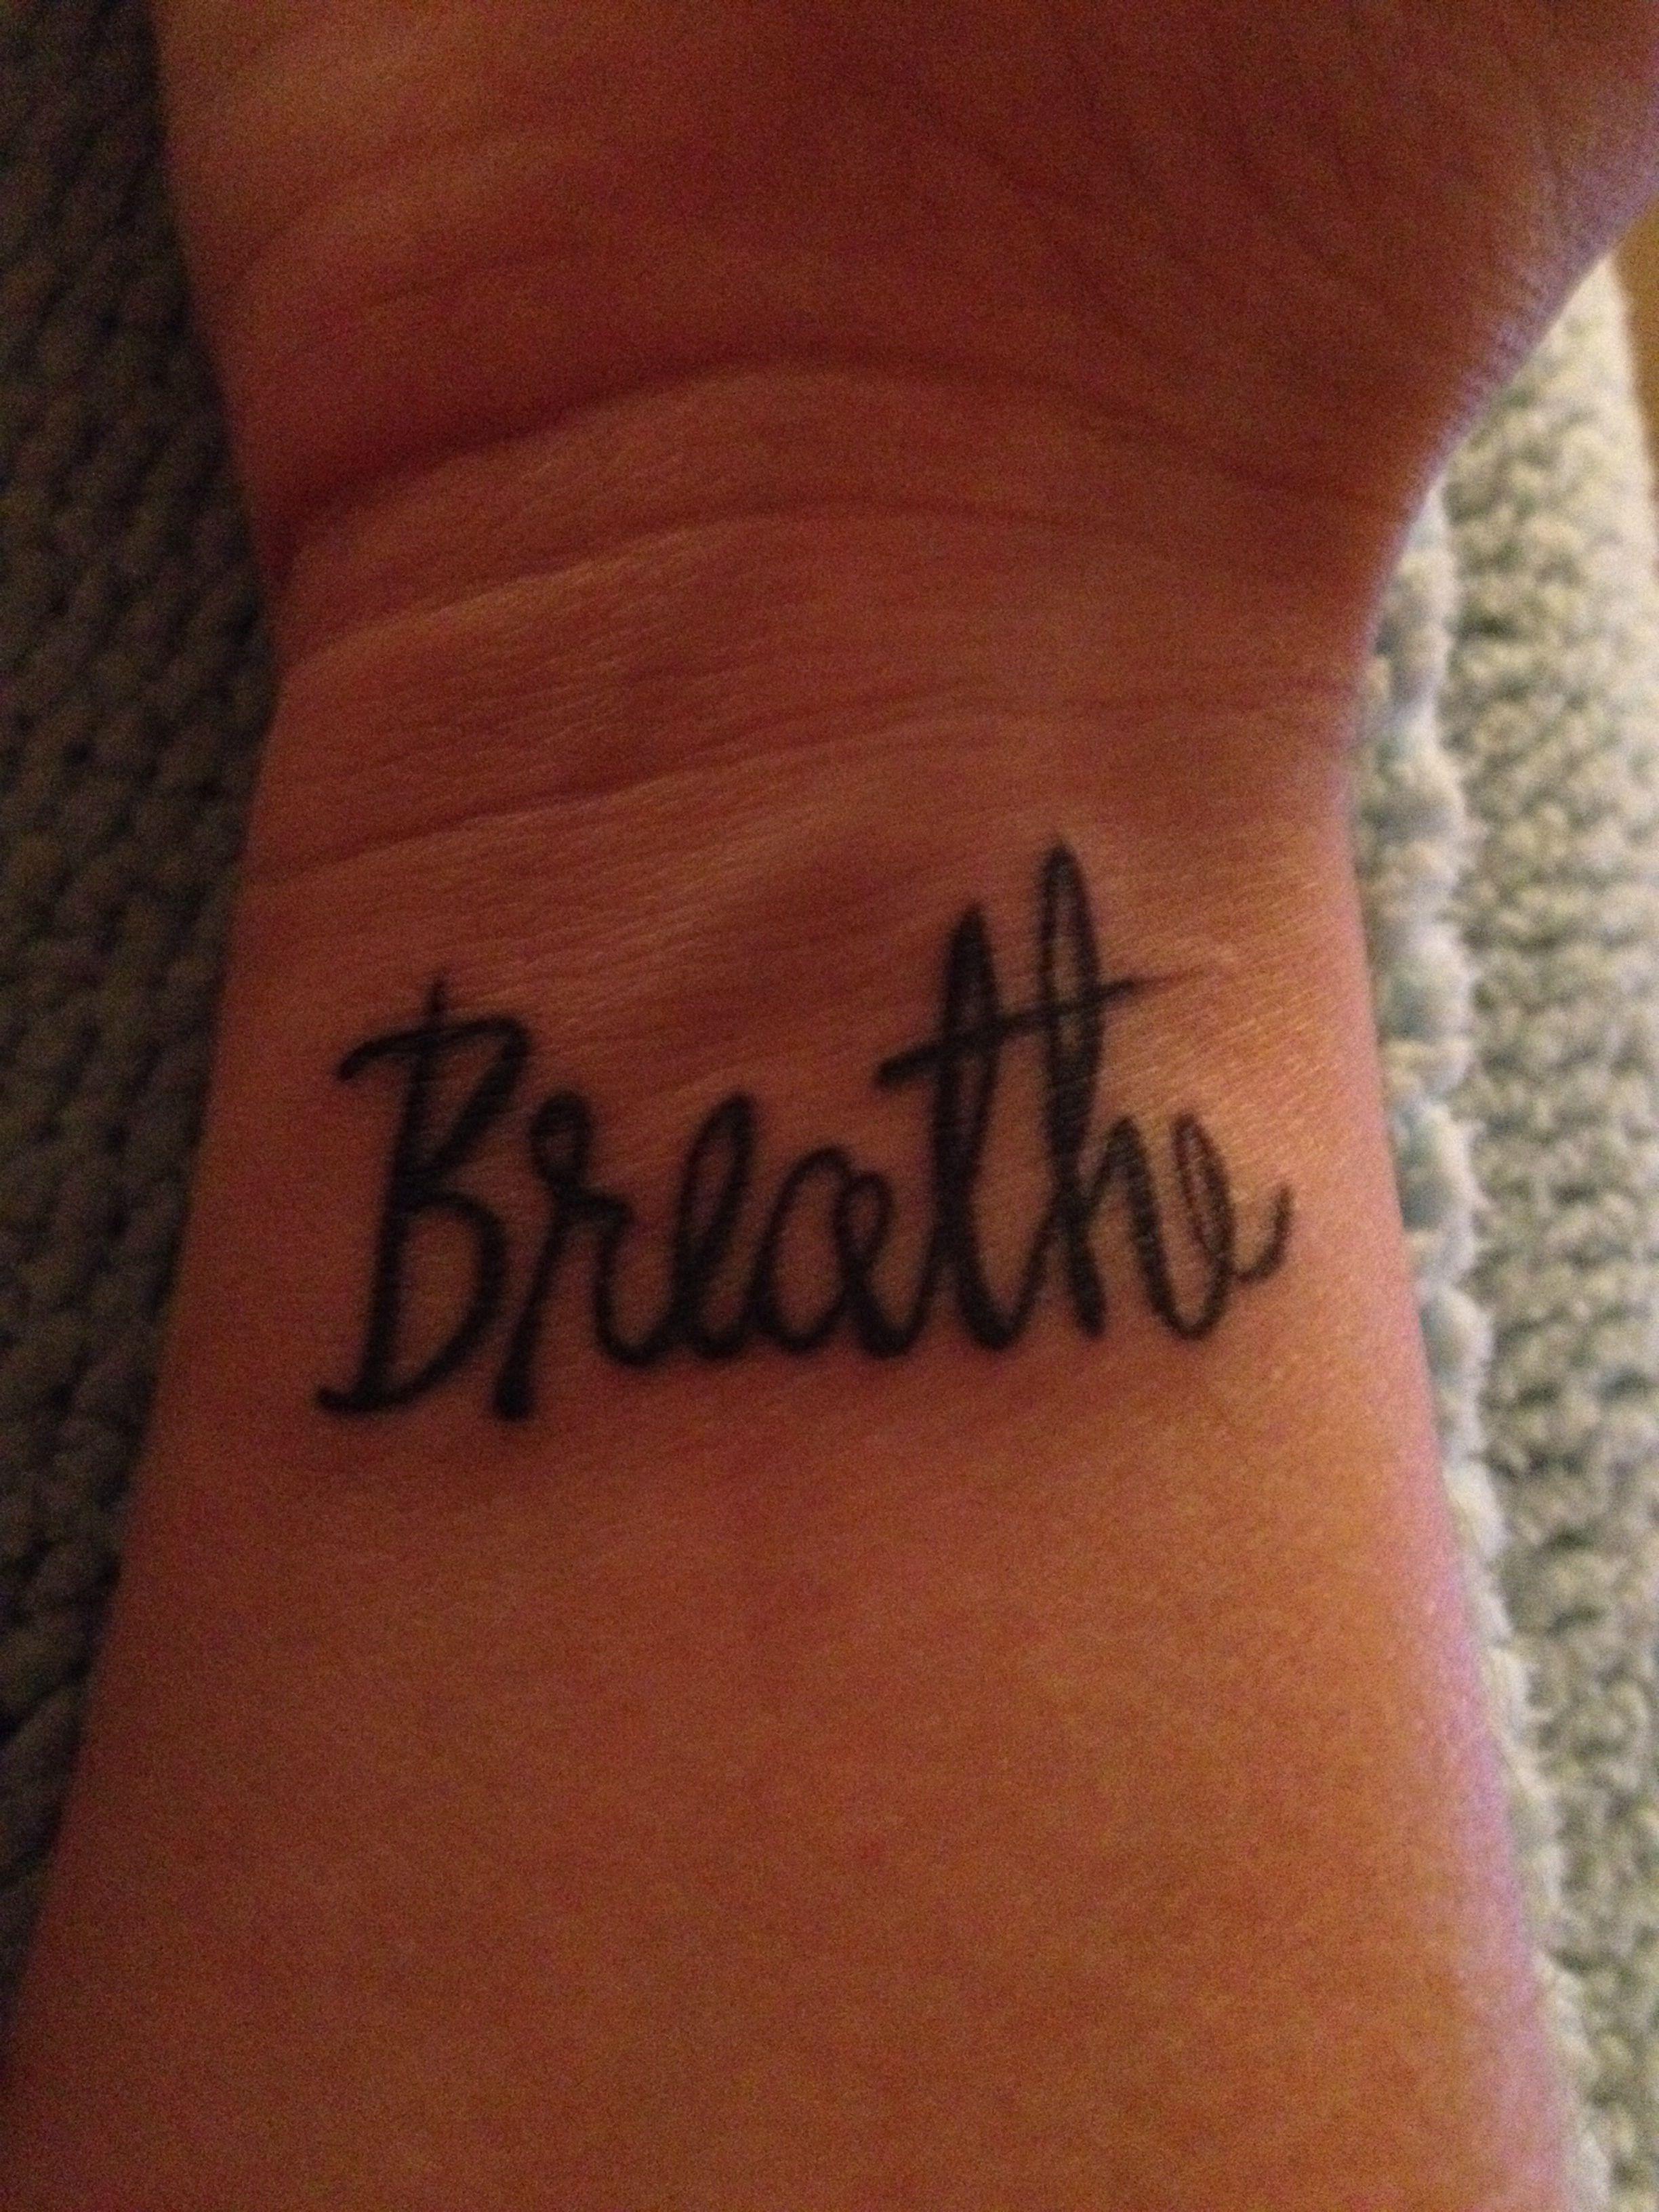 Exit 13 Tattoo : tattoo, Tattoo, Tattoos,, Tattoos